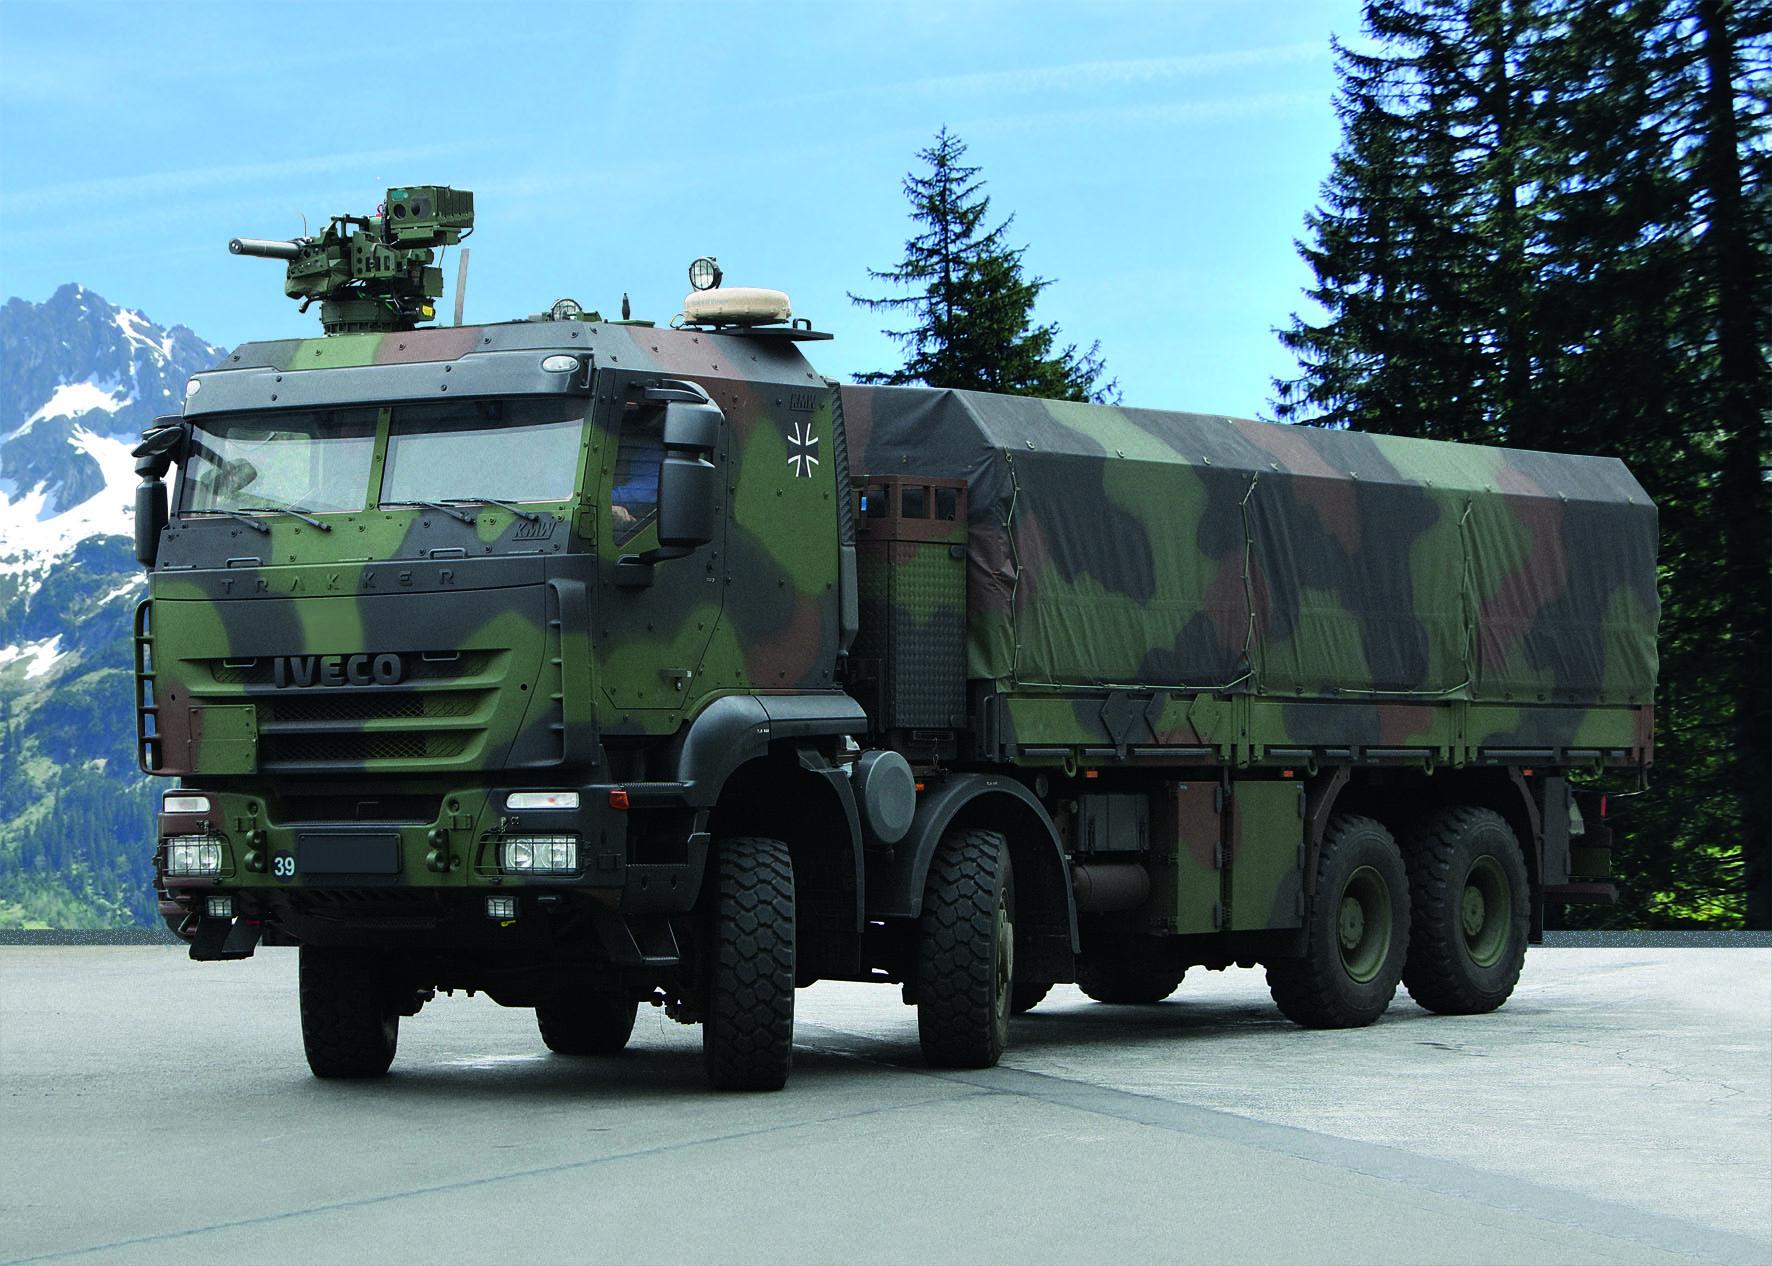 Imagem 1 e 2 Trakker-Bundeswehr